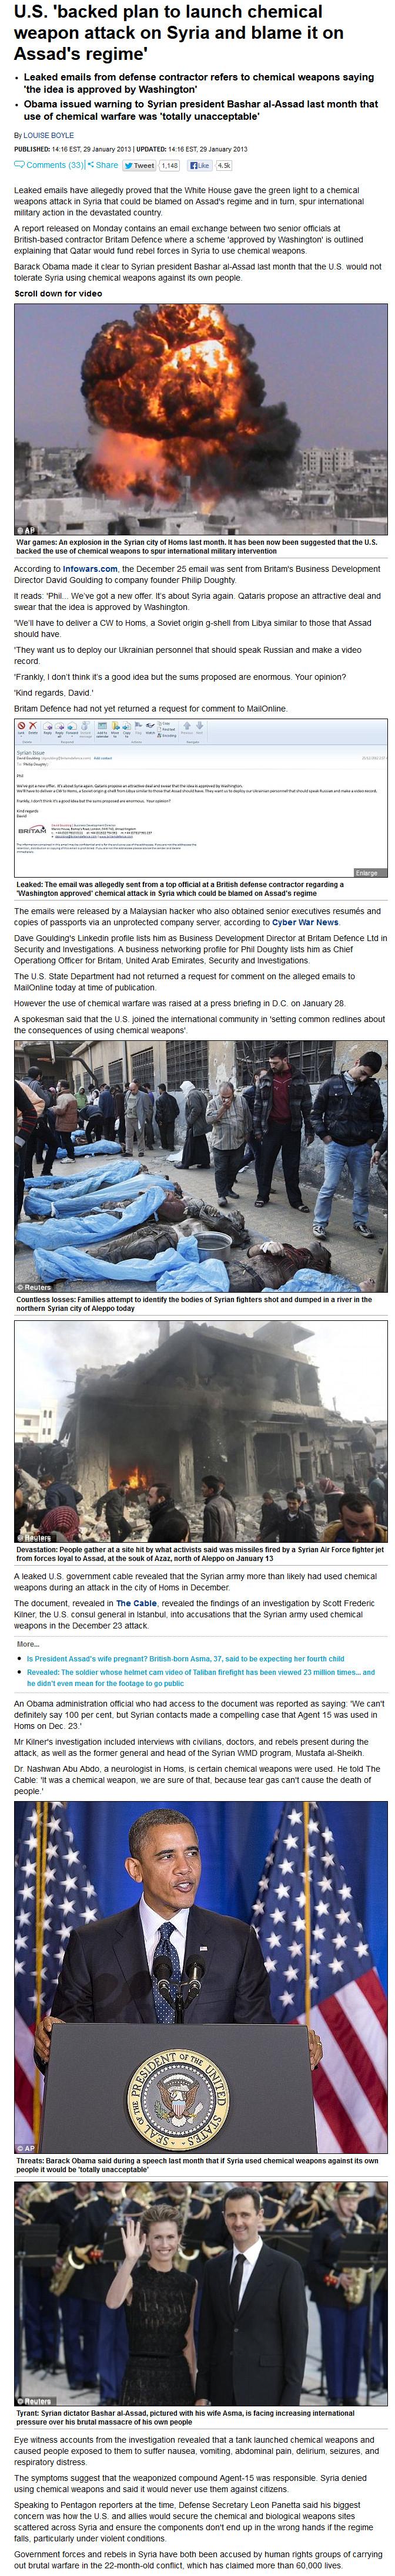 chemische wapens syrie US akkoord